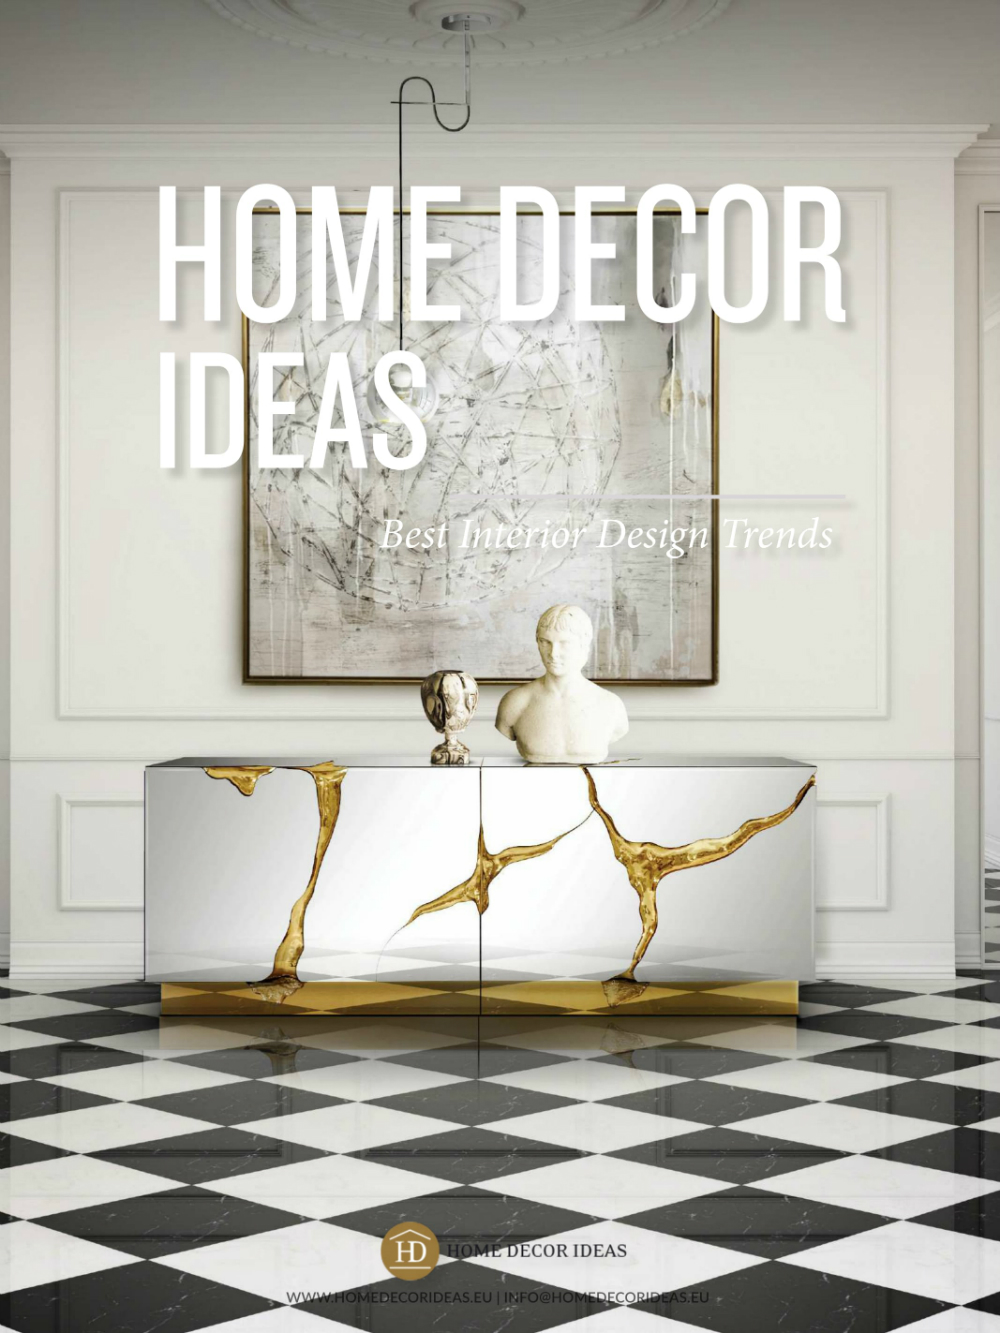 100 Home Decor Ideas home decor ideas 100 Modern Home Decor Ideas 100 home decor ideas 001 4